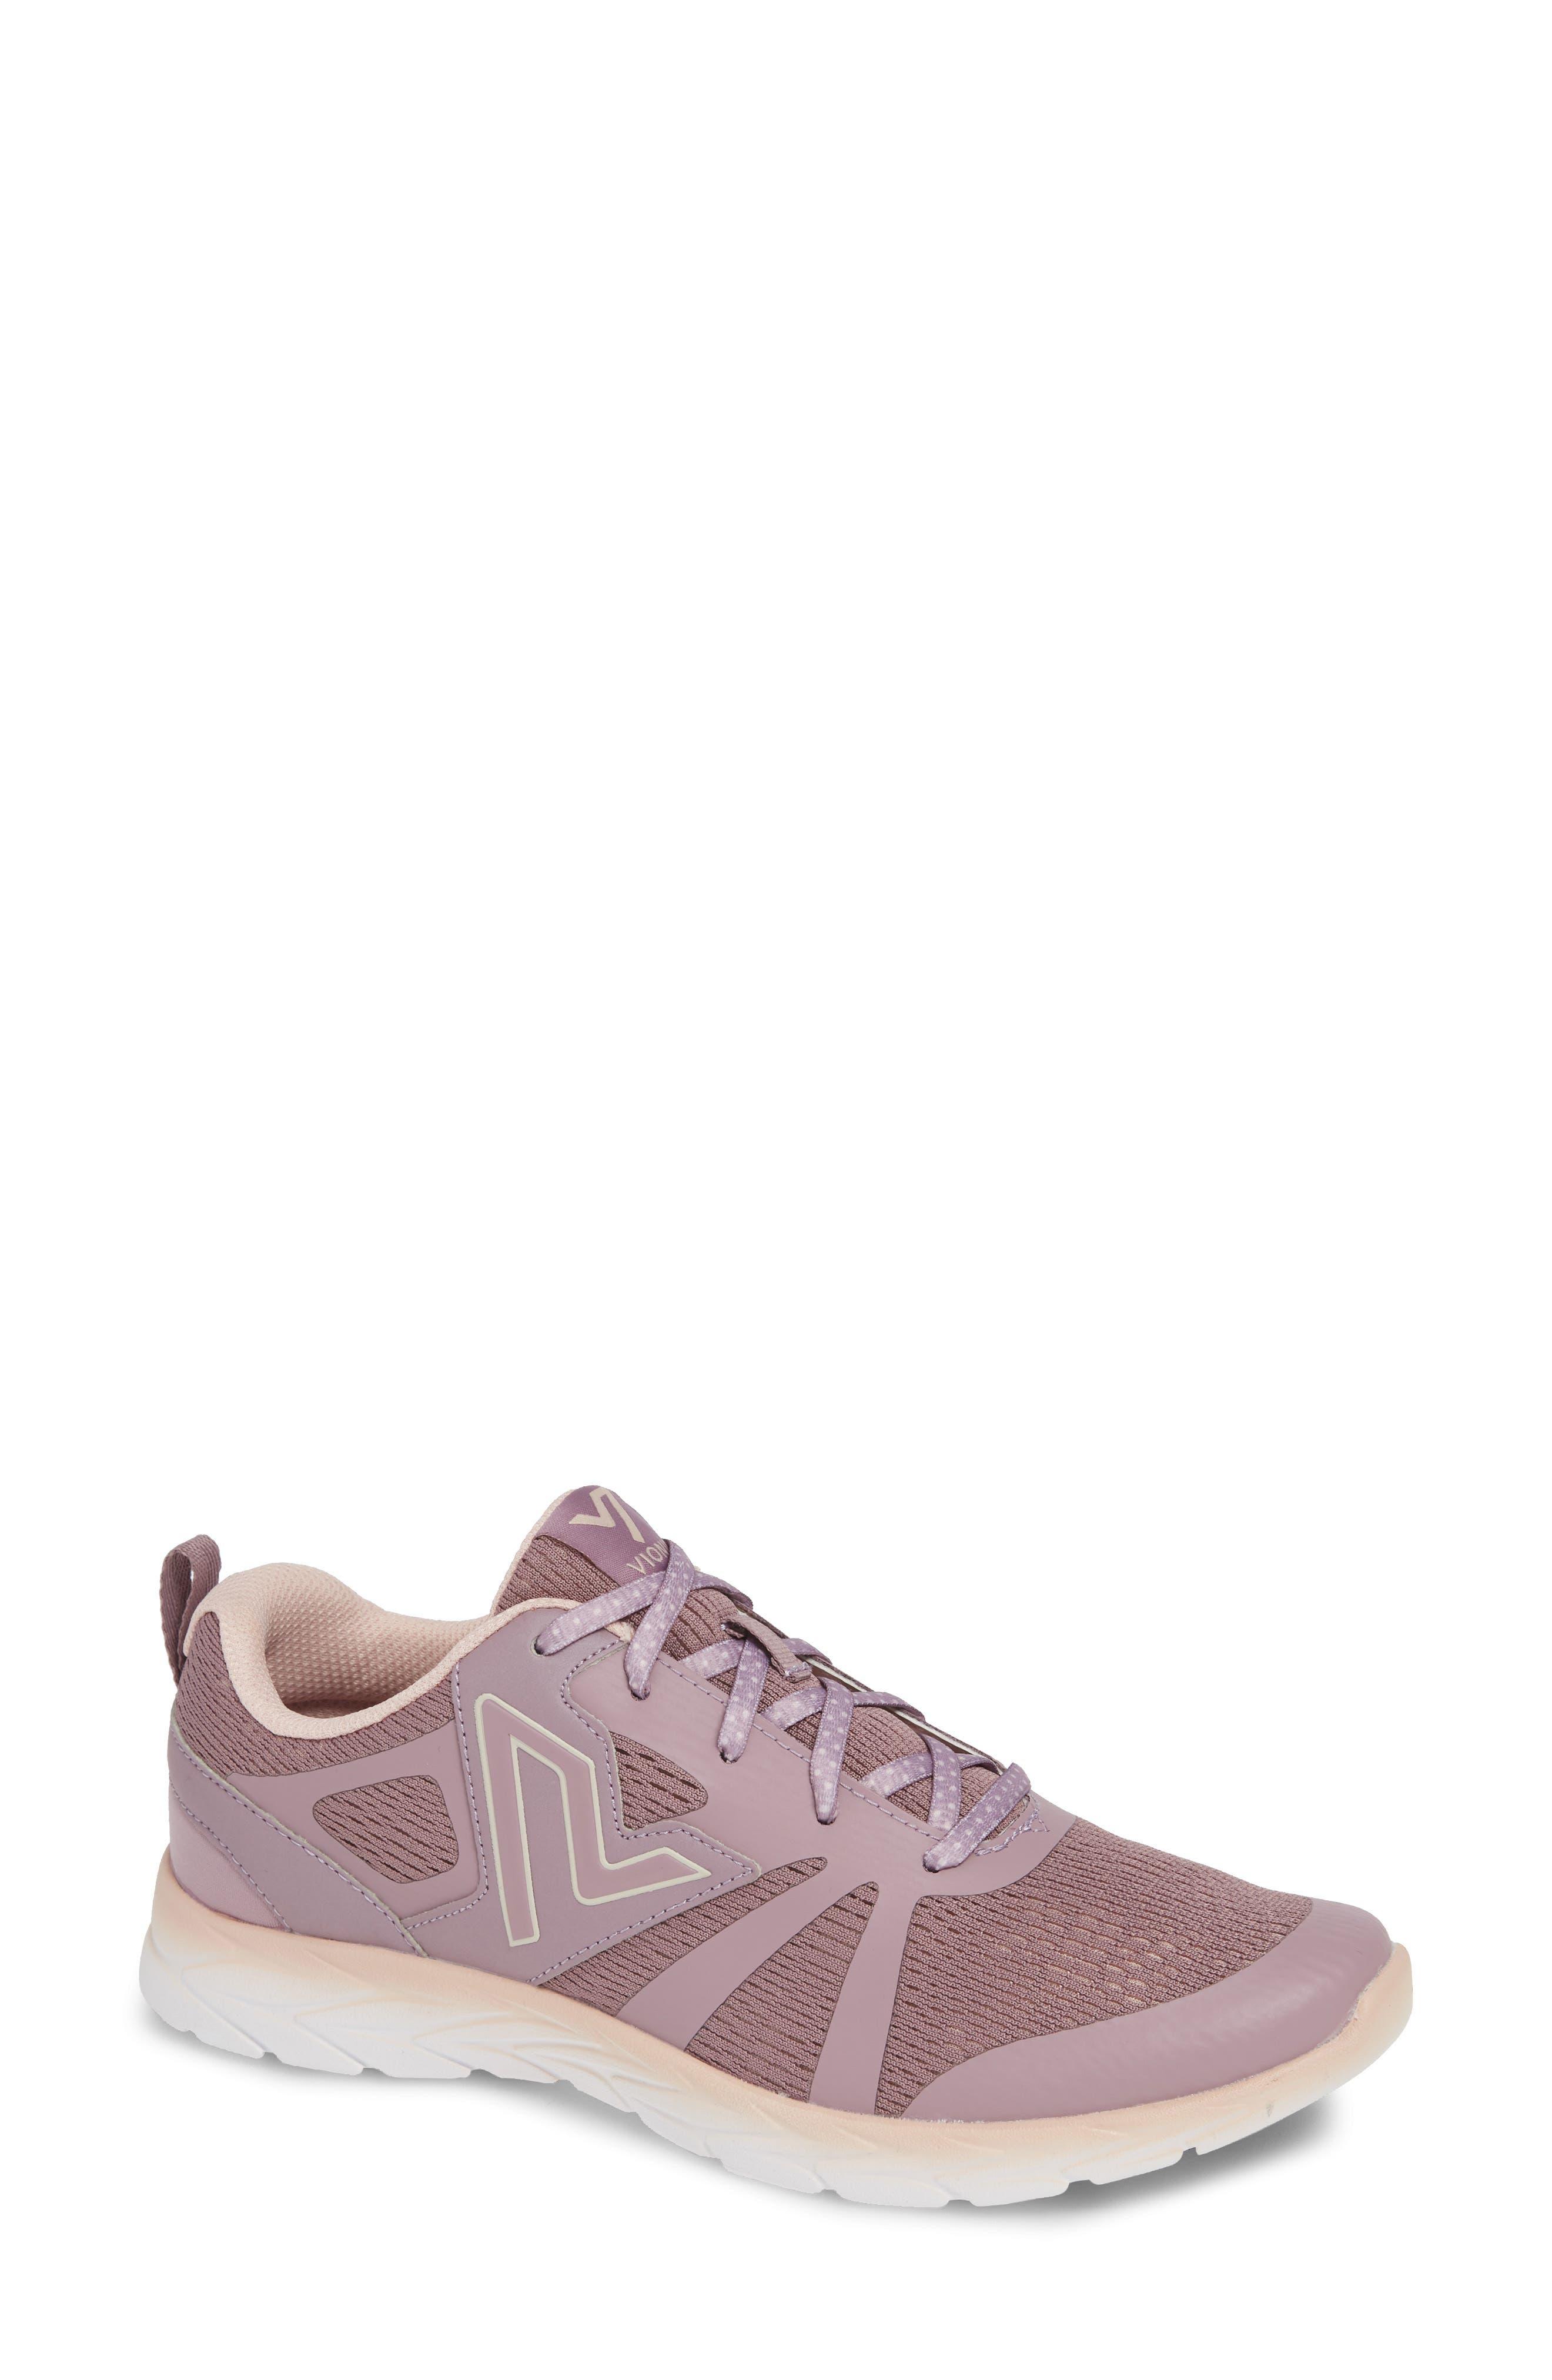 Vionic Brisk Miles Sneaker, Purple